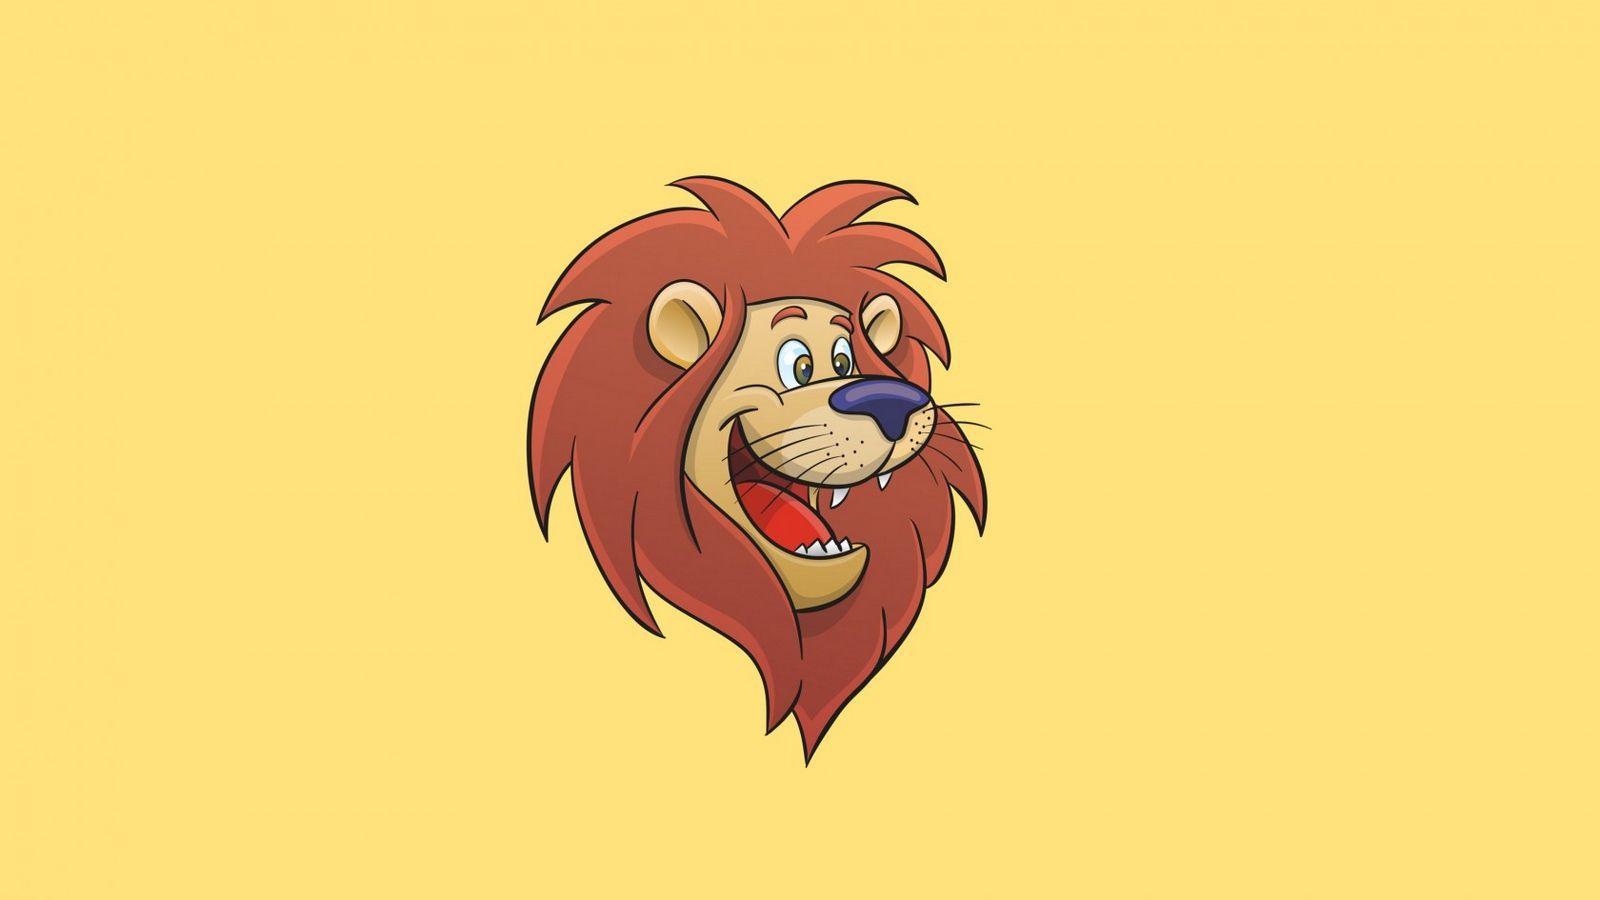 Lion Cartoon Wallpapers Top Free Lion Cartoon Backgrounds Wallpaperaccess